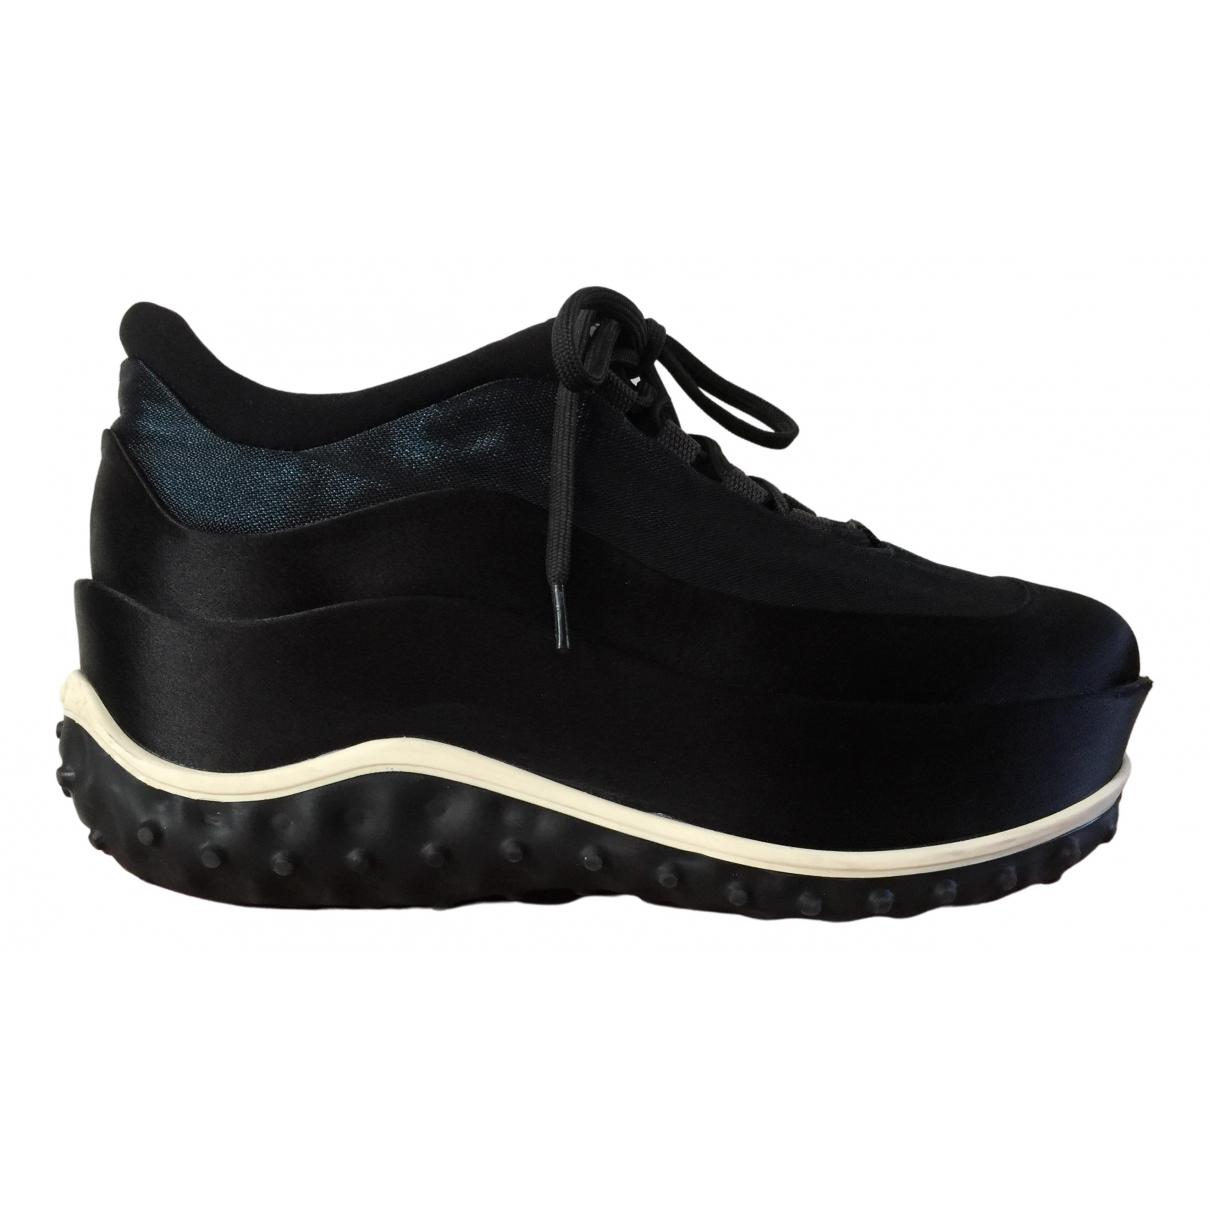 Miu Miu \N Black Cloth Trainers for Women 37.5 IT